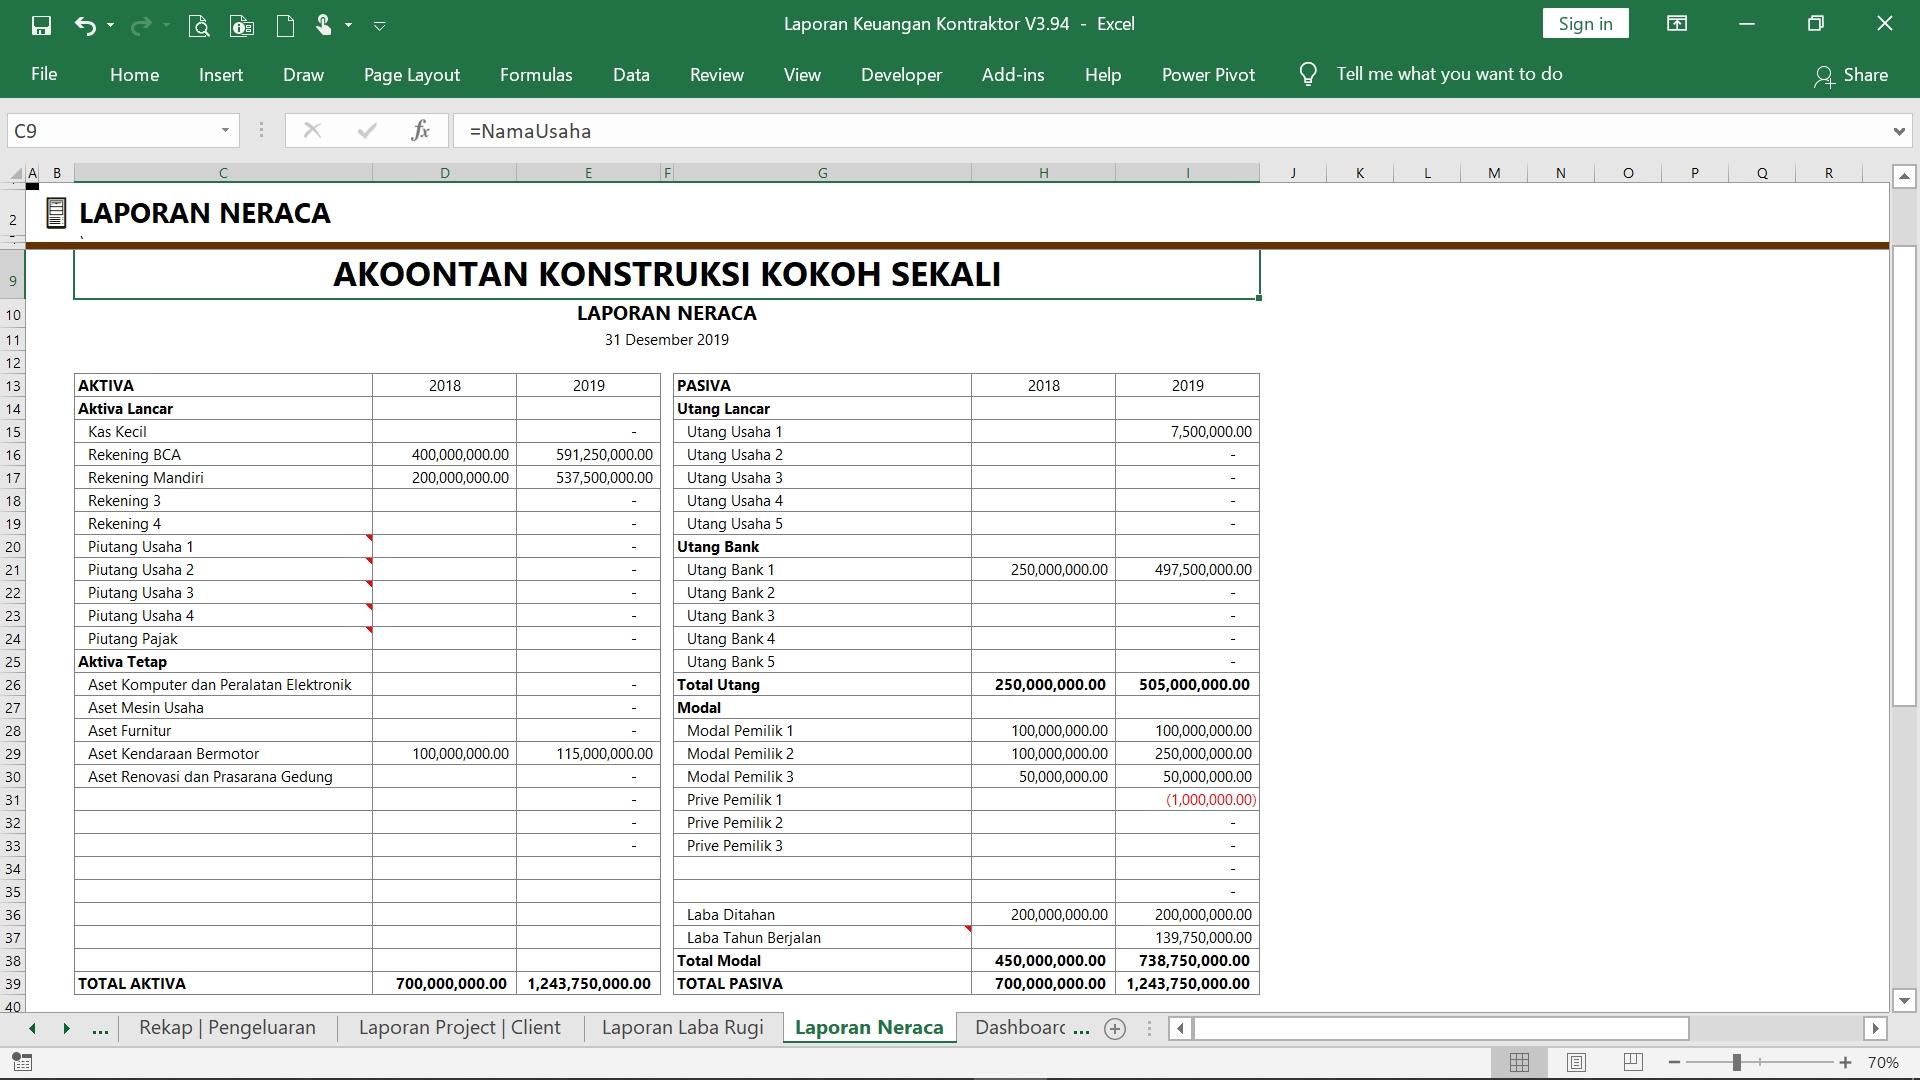 Ak019 Aw Xl Laporan Keuangan Jasa Konstruksi Akoontan